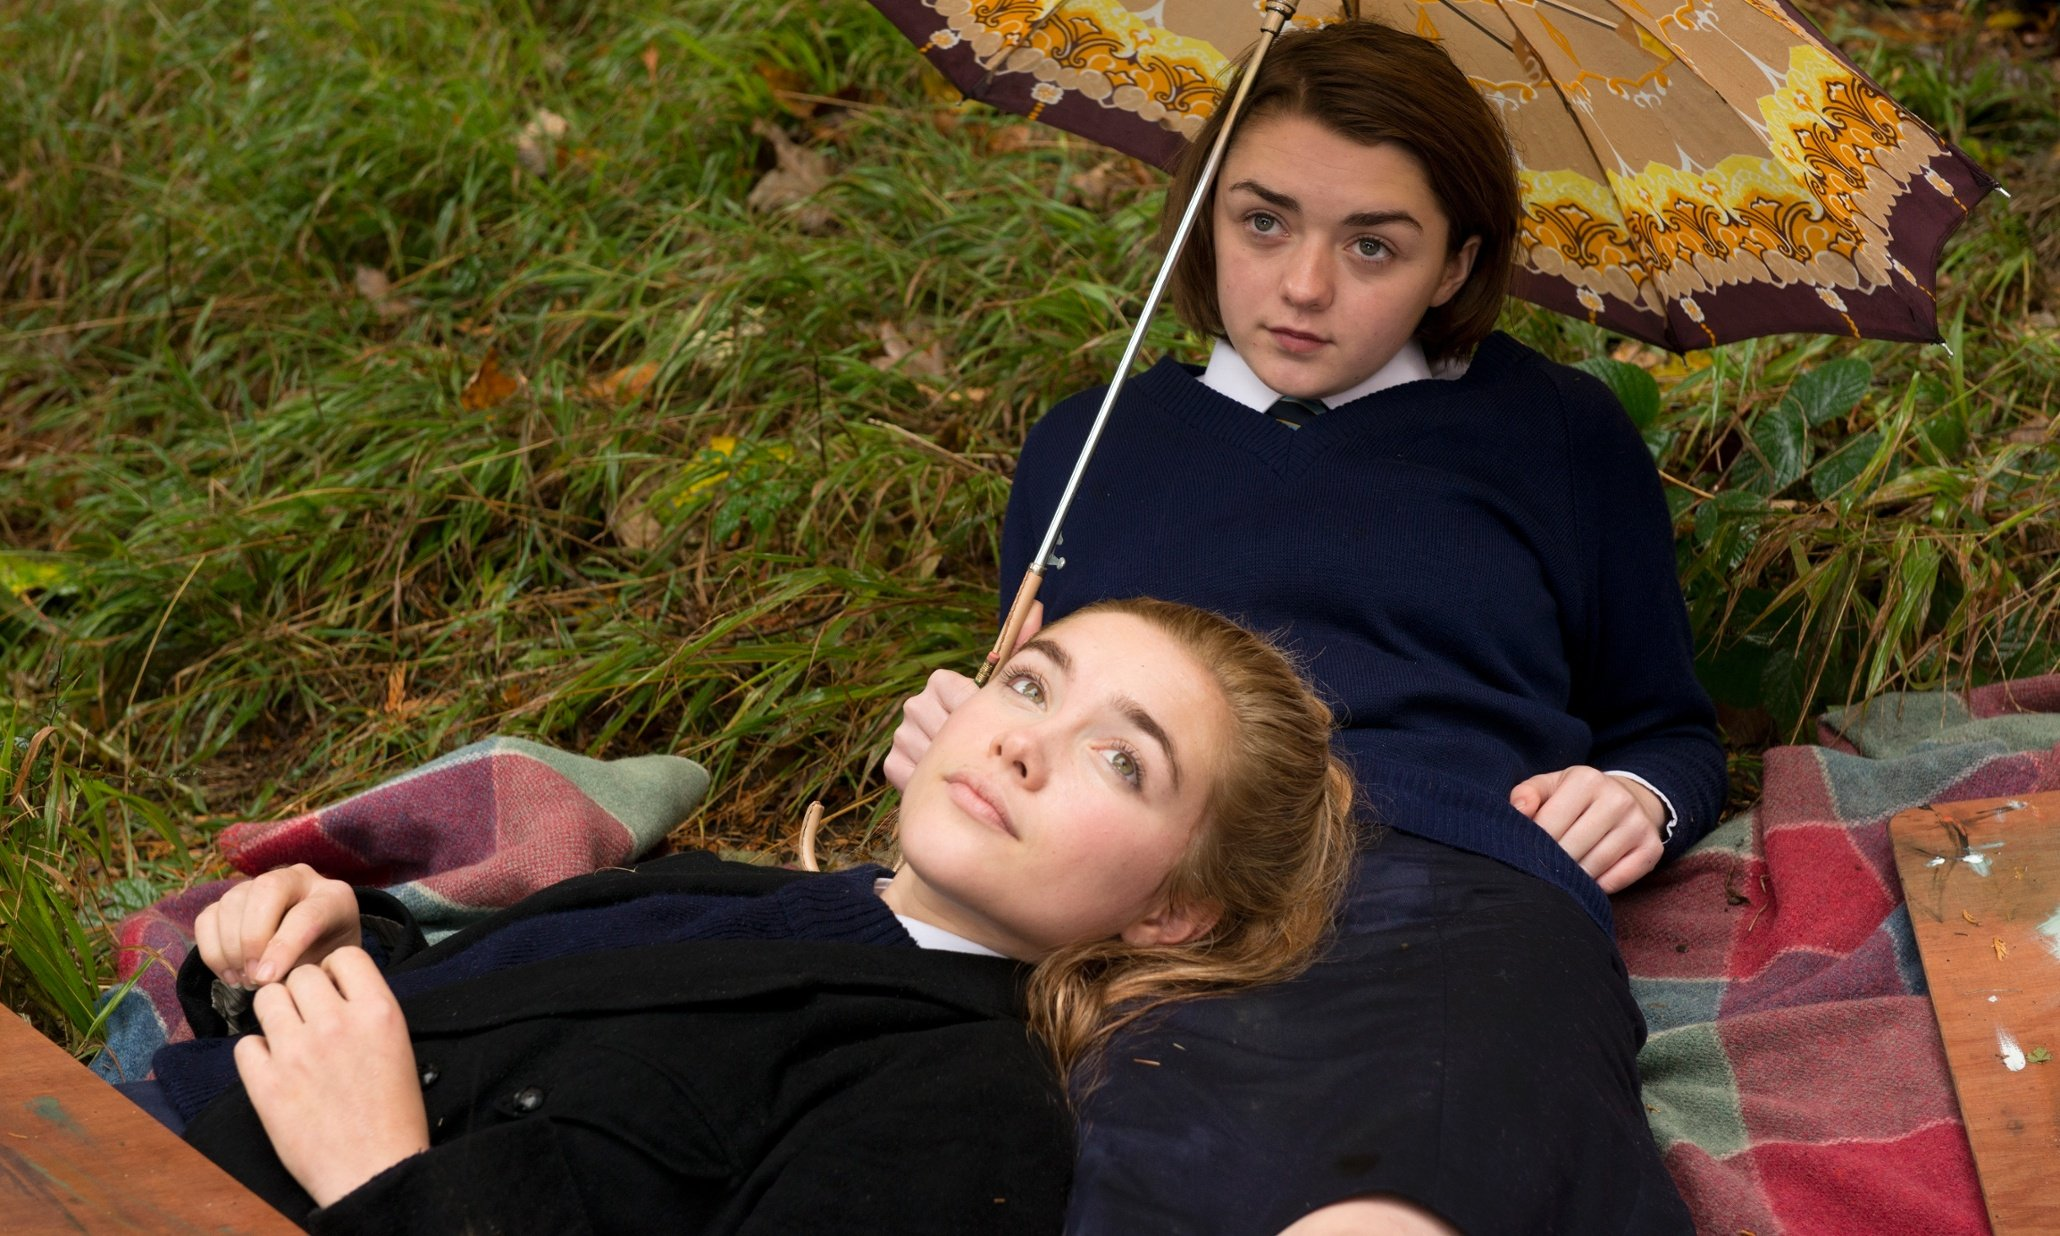 The Falling 2015 British Horror Film